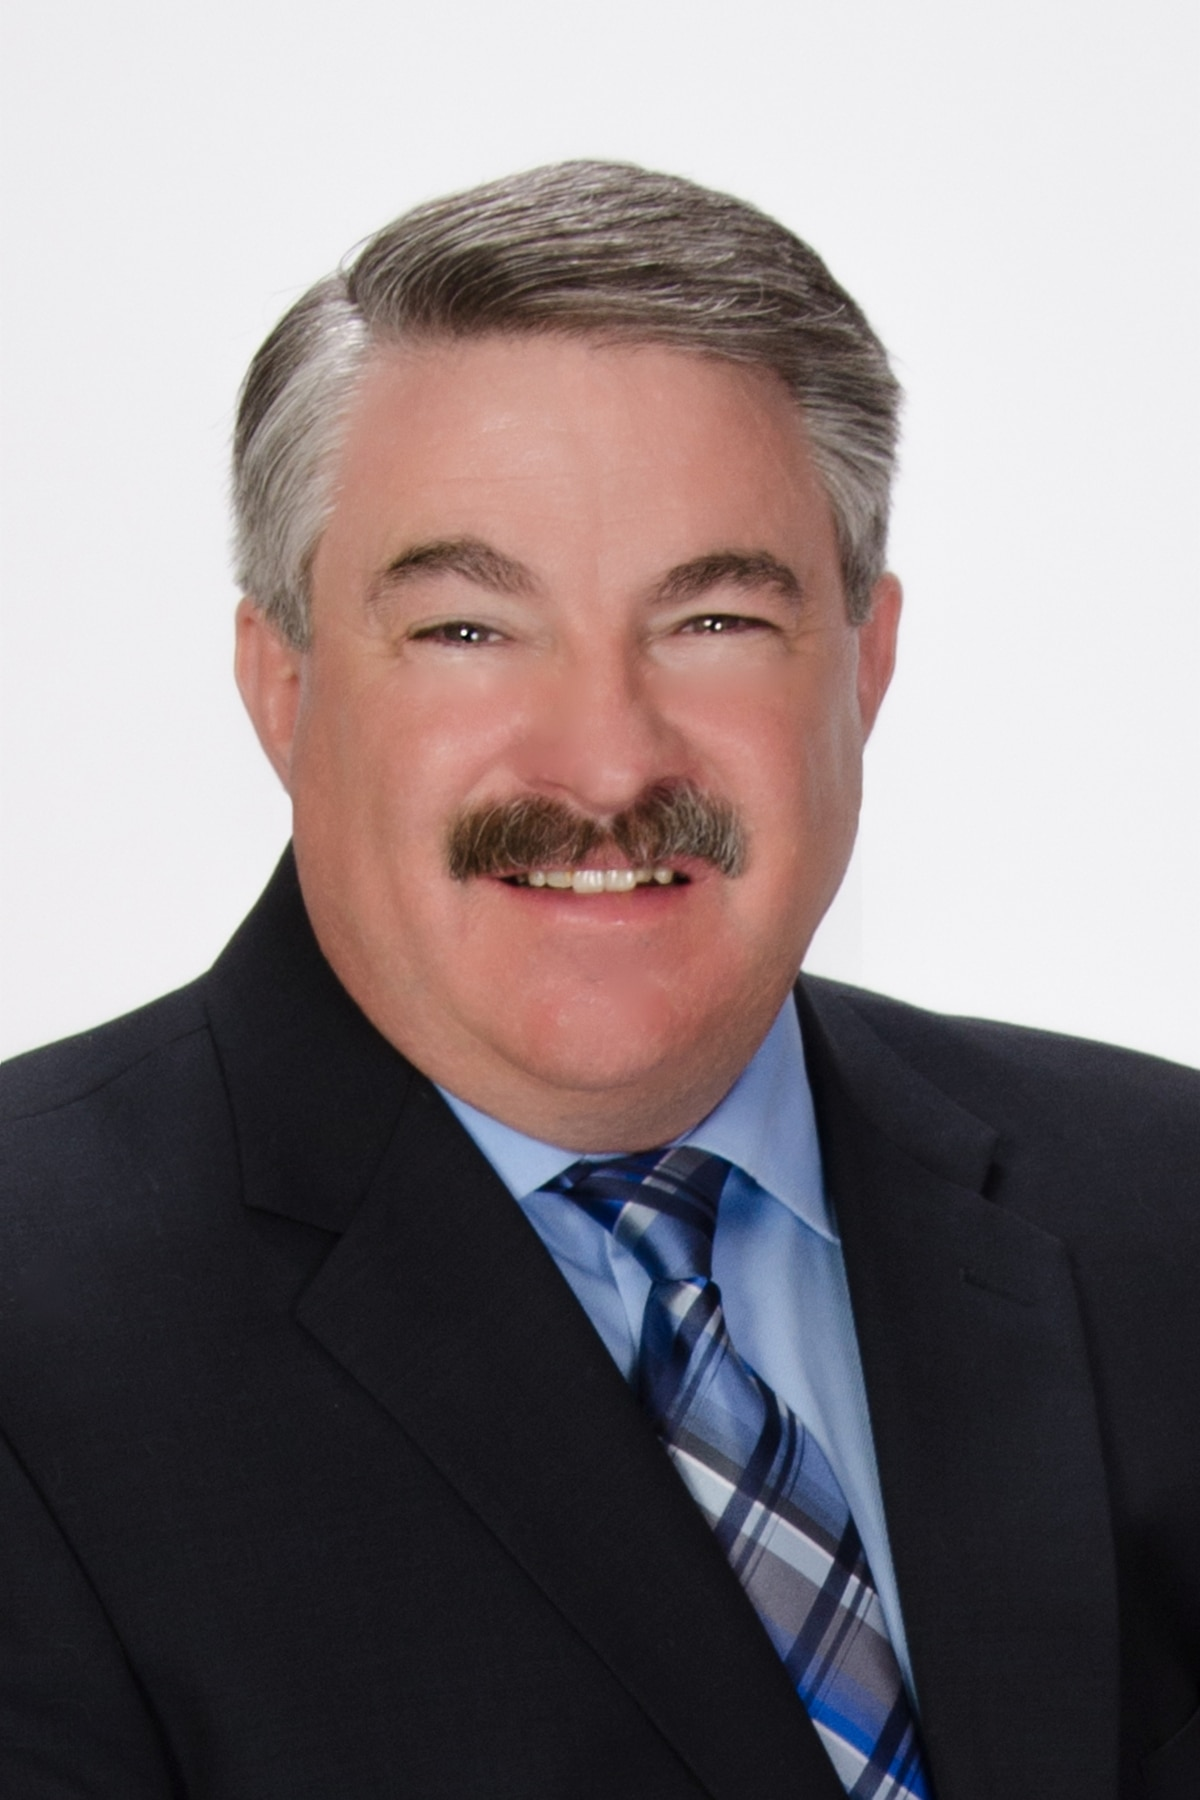 WILLIAM A. HASTINGS Financial Advisor